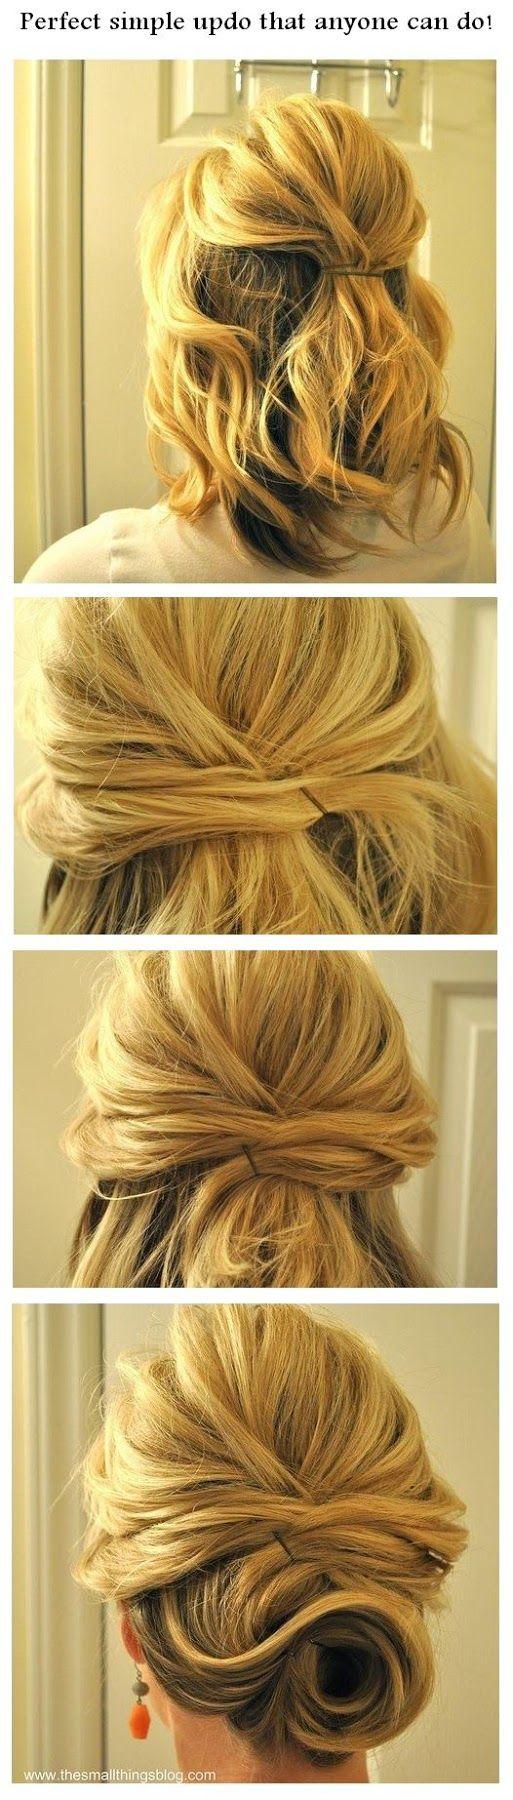 best hairs images on pinterest blonde hair colors blonde hair